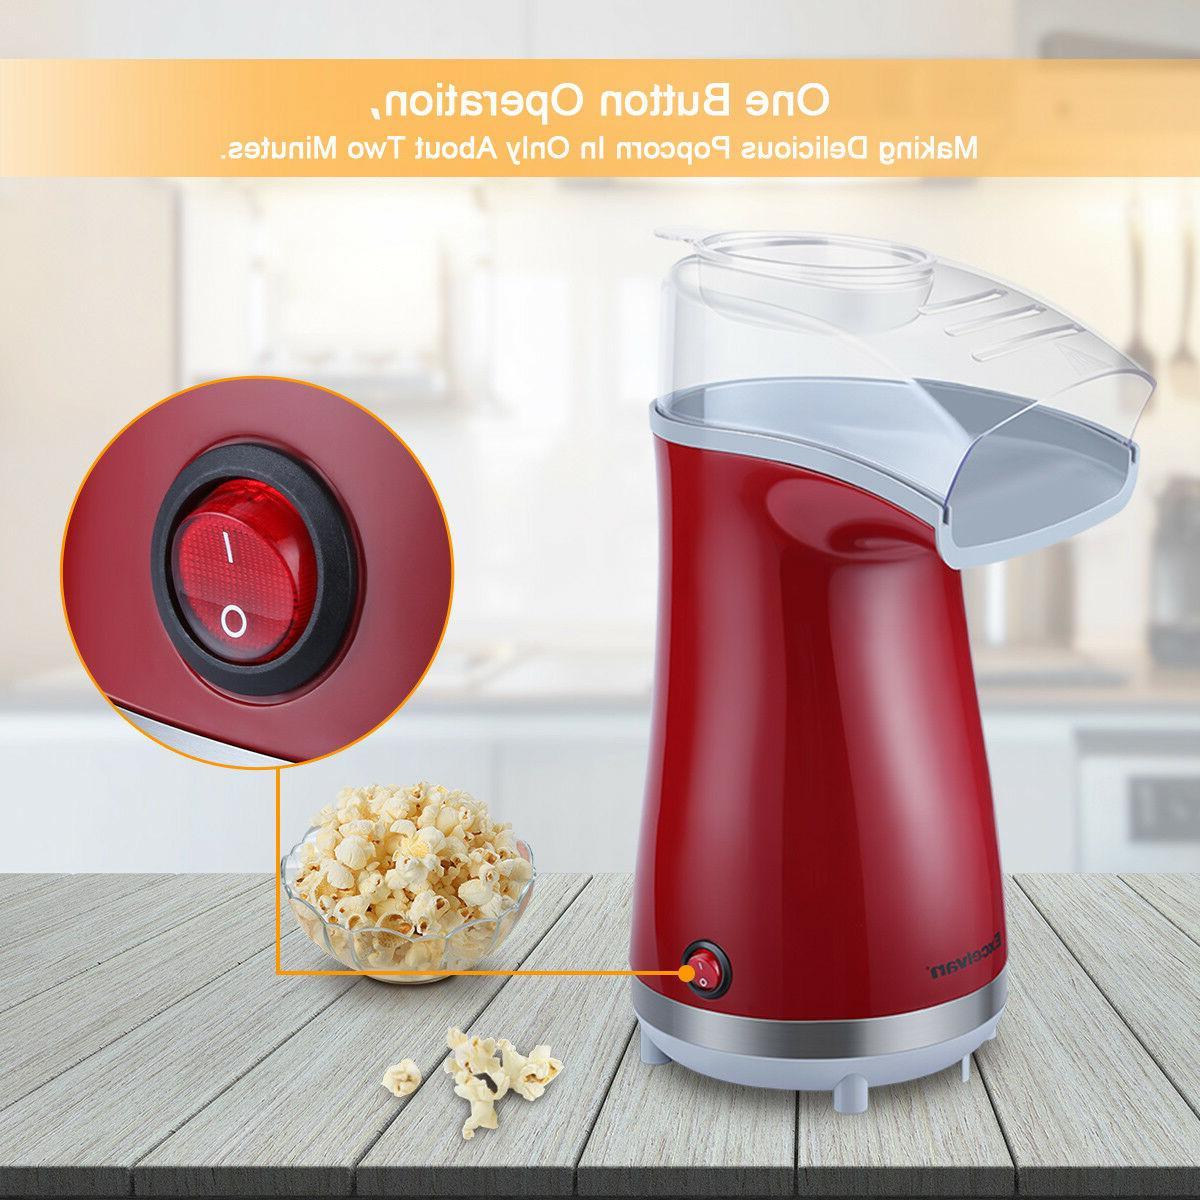 16 Air-Pop Popcorn Maker Makes w/ Measuring Home Snack